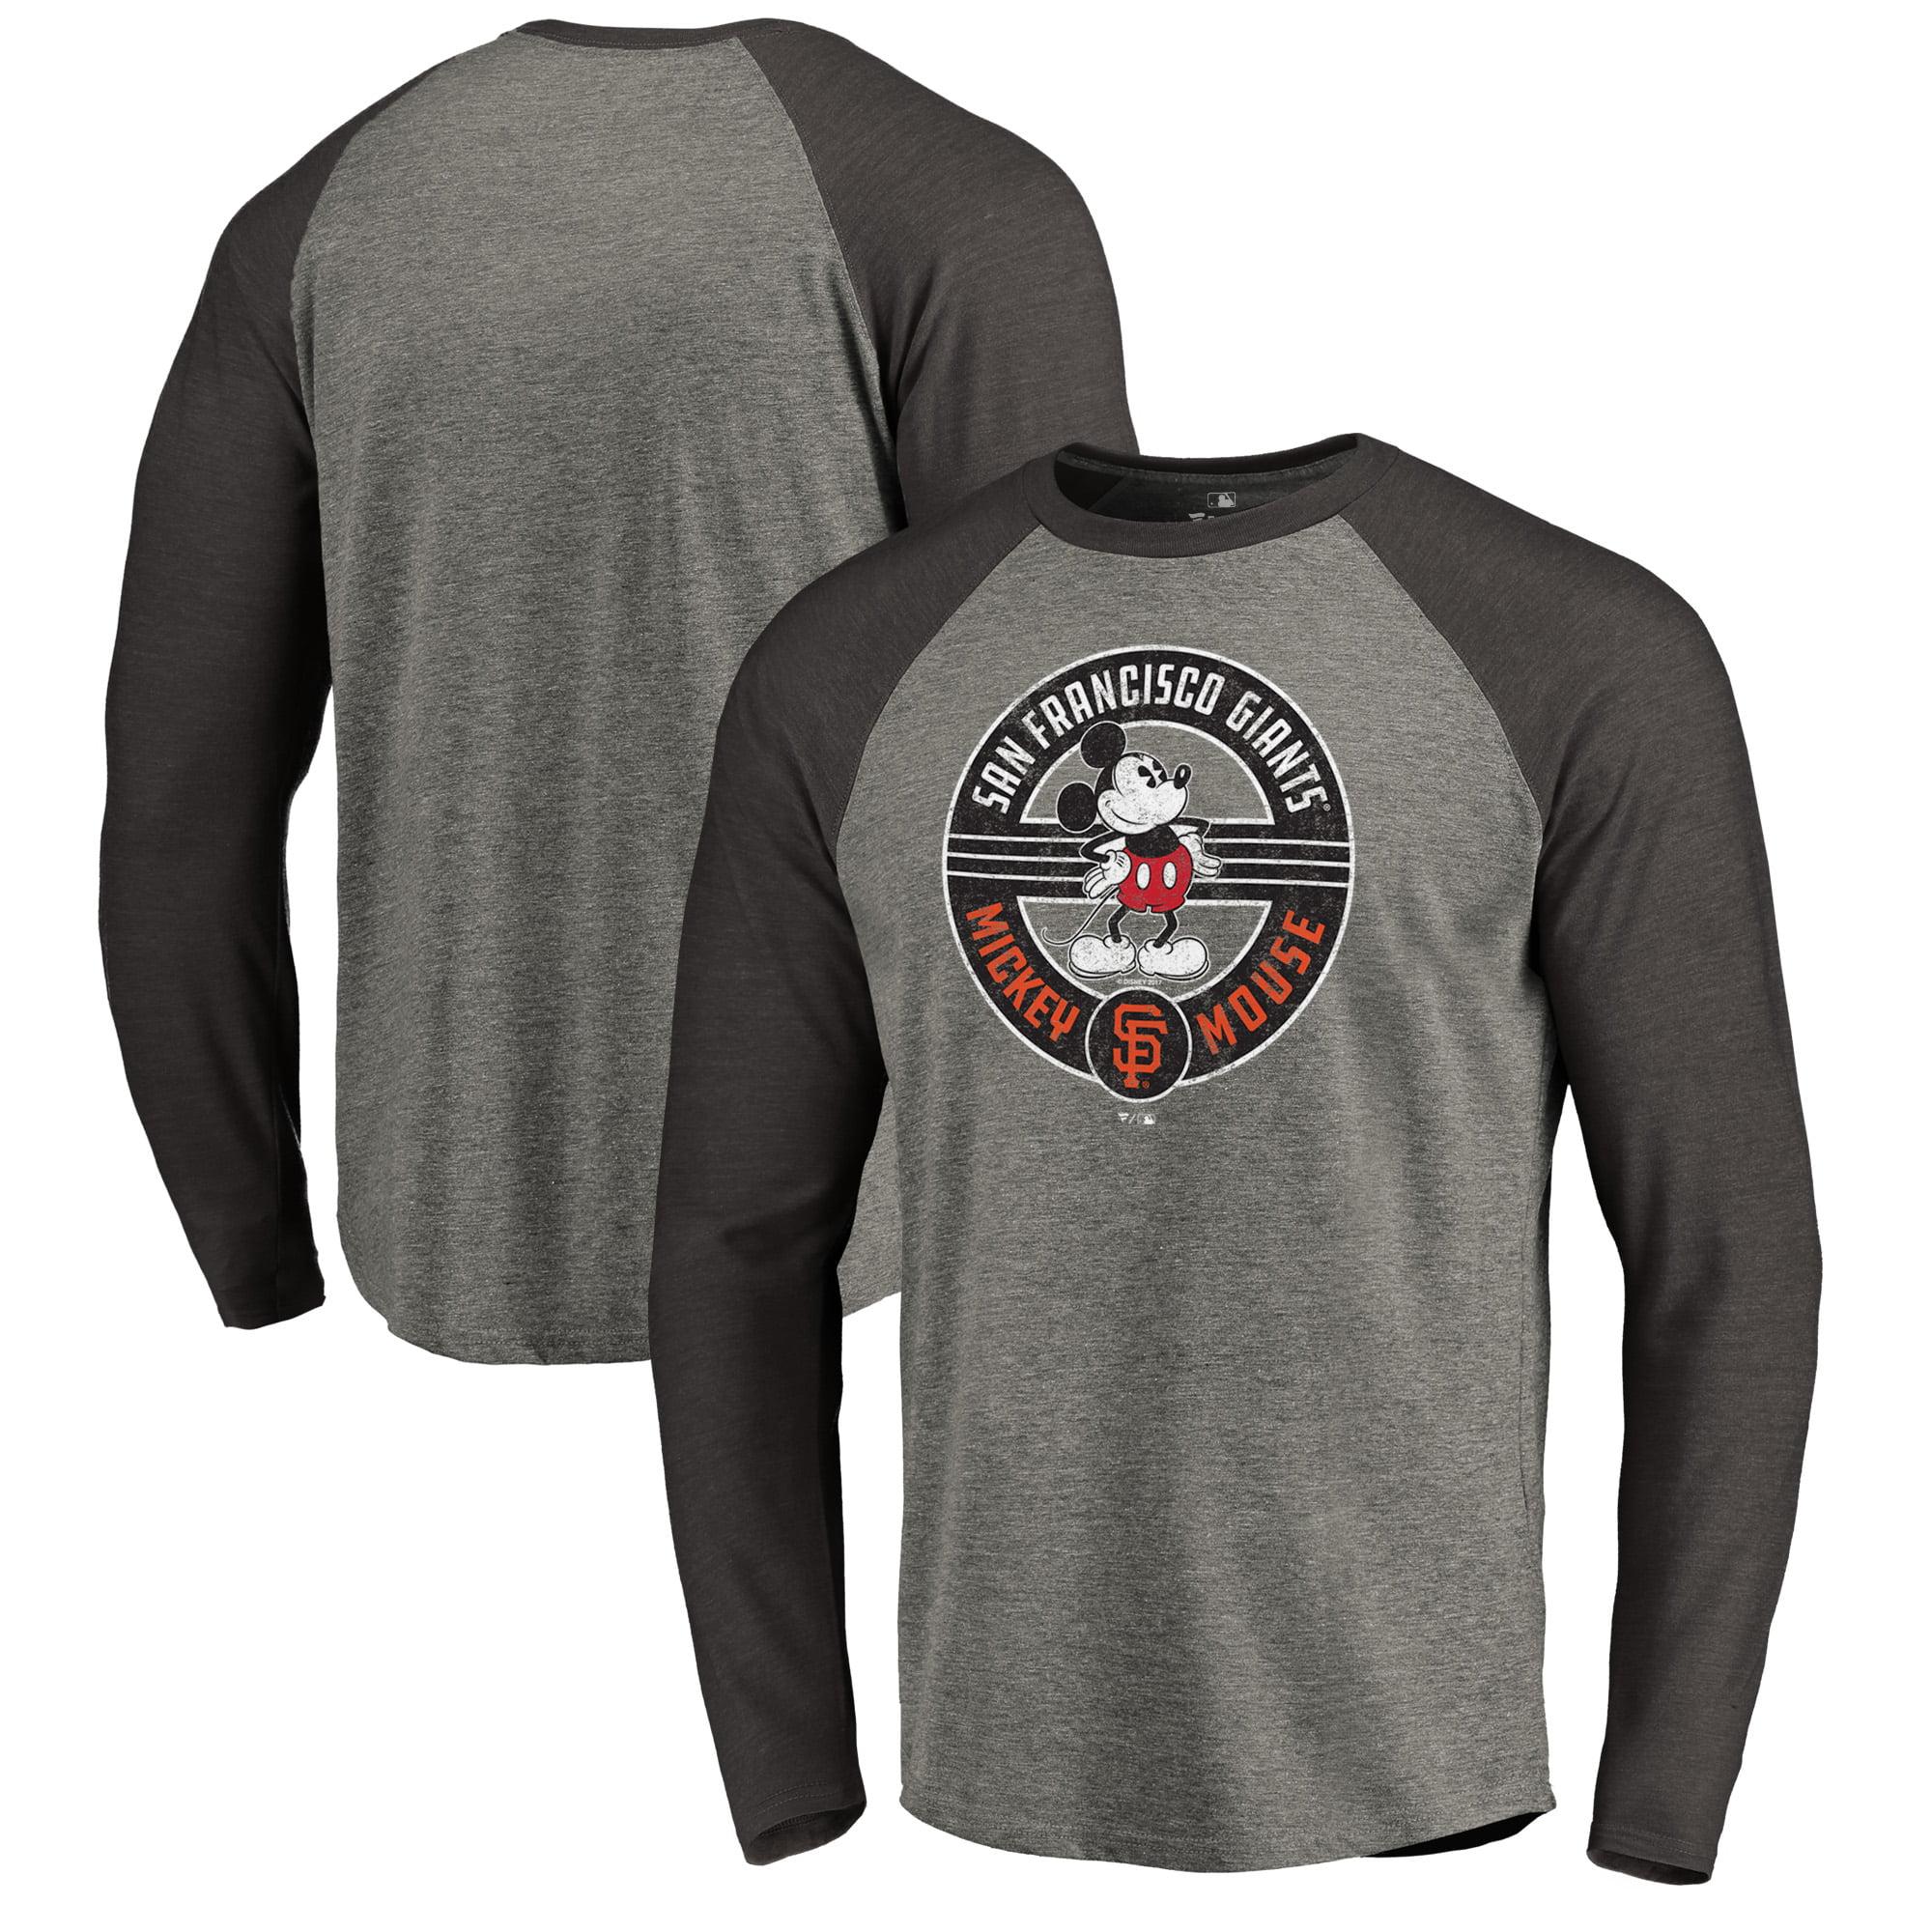 San Francisco Giants Fanatics Branded Disney Mickey's True Original Seal Long Sleeve Tri-Blend Raglan T-Shirt - Heathered Gray